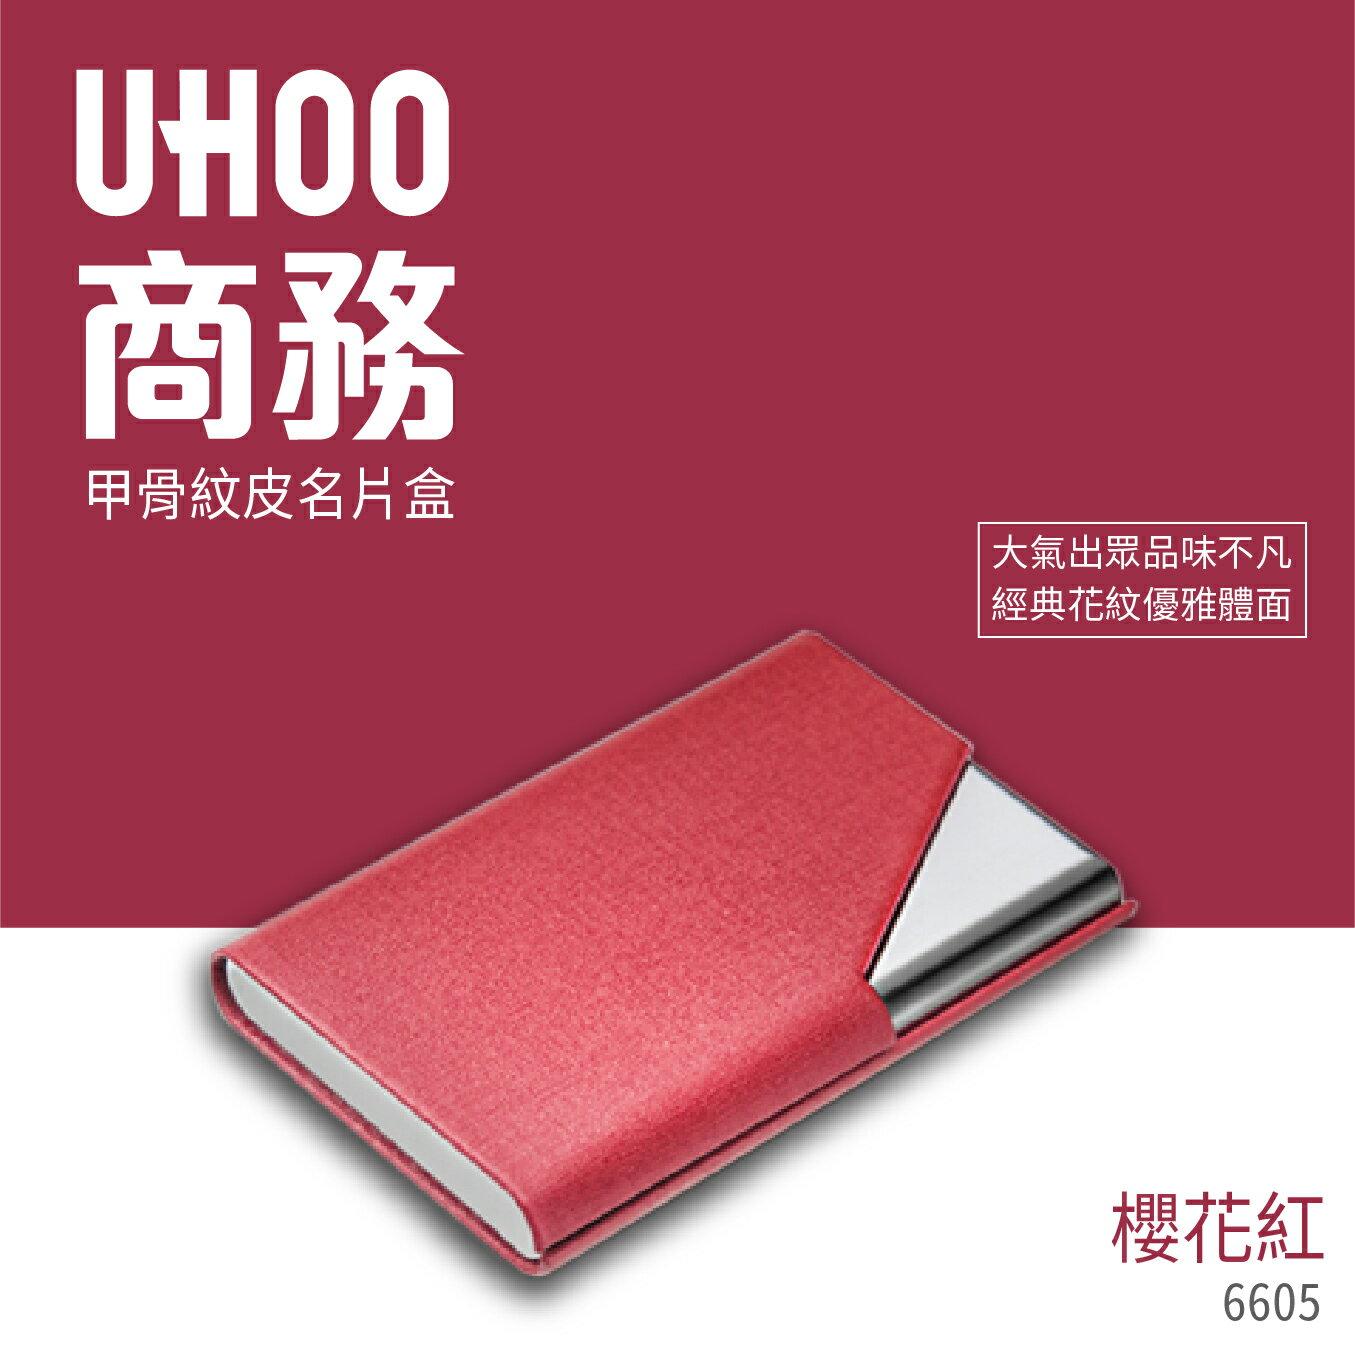 UHOO 6605 商務名片盒(紅)名片夾 業務 盒子 名片收納 自我介紹 商務交流 合作名片 卡夾 車票夾 證件夾